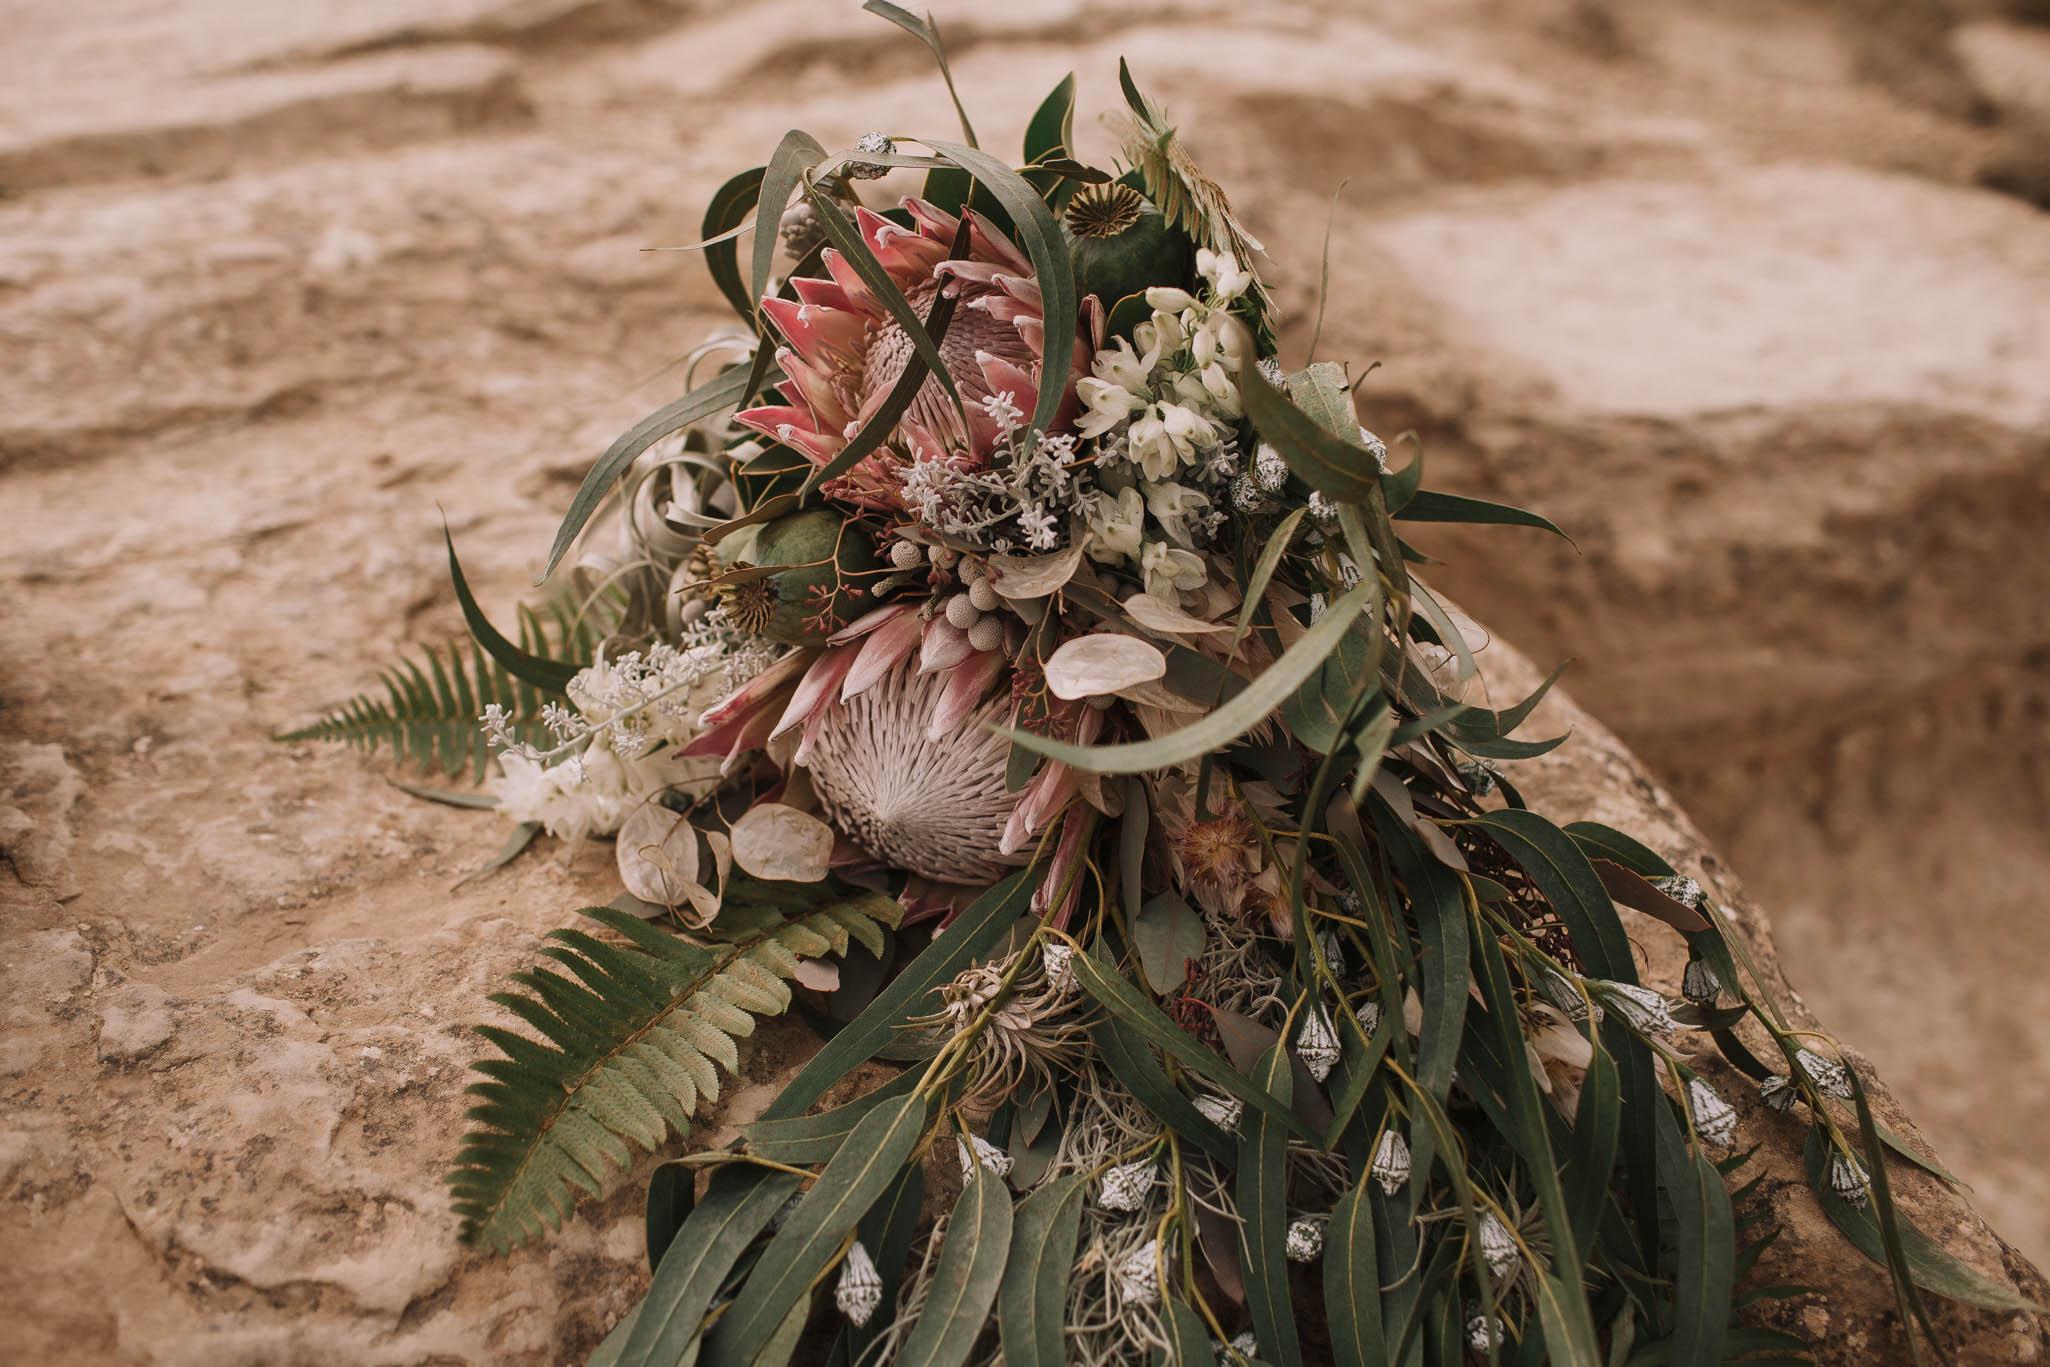 Spain-wedding-photographer-bardenas-reales-jeremy-boyer-photographe-mariage-bordeaux-floral-wedding-dress-robe-127.jpg